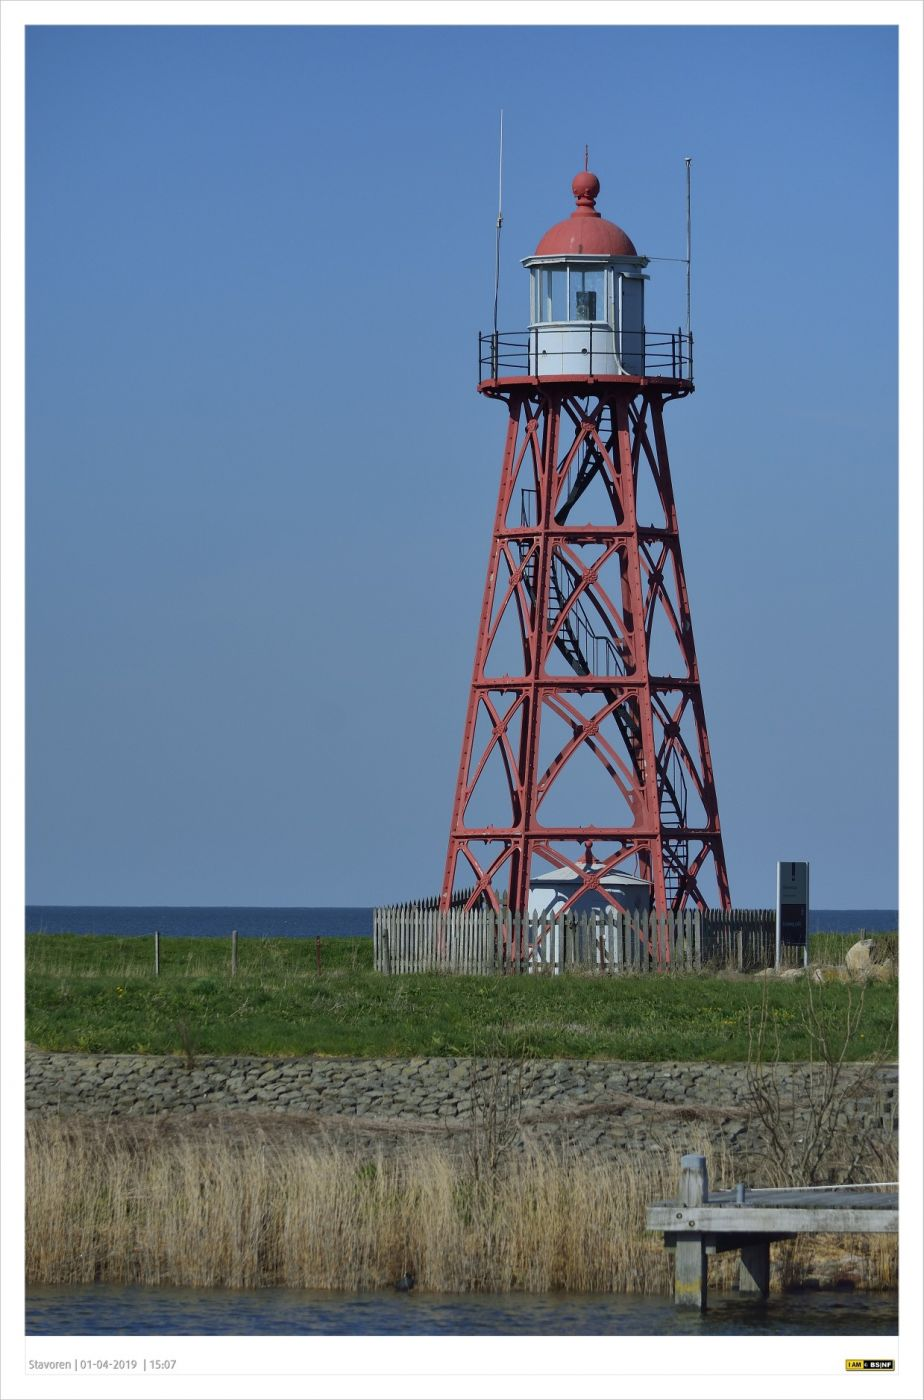 Lighthouse at Stavoren, Netherlands